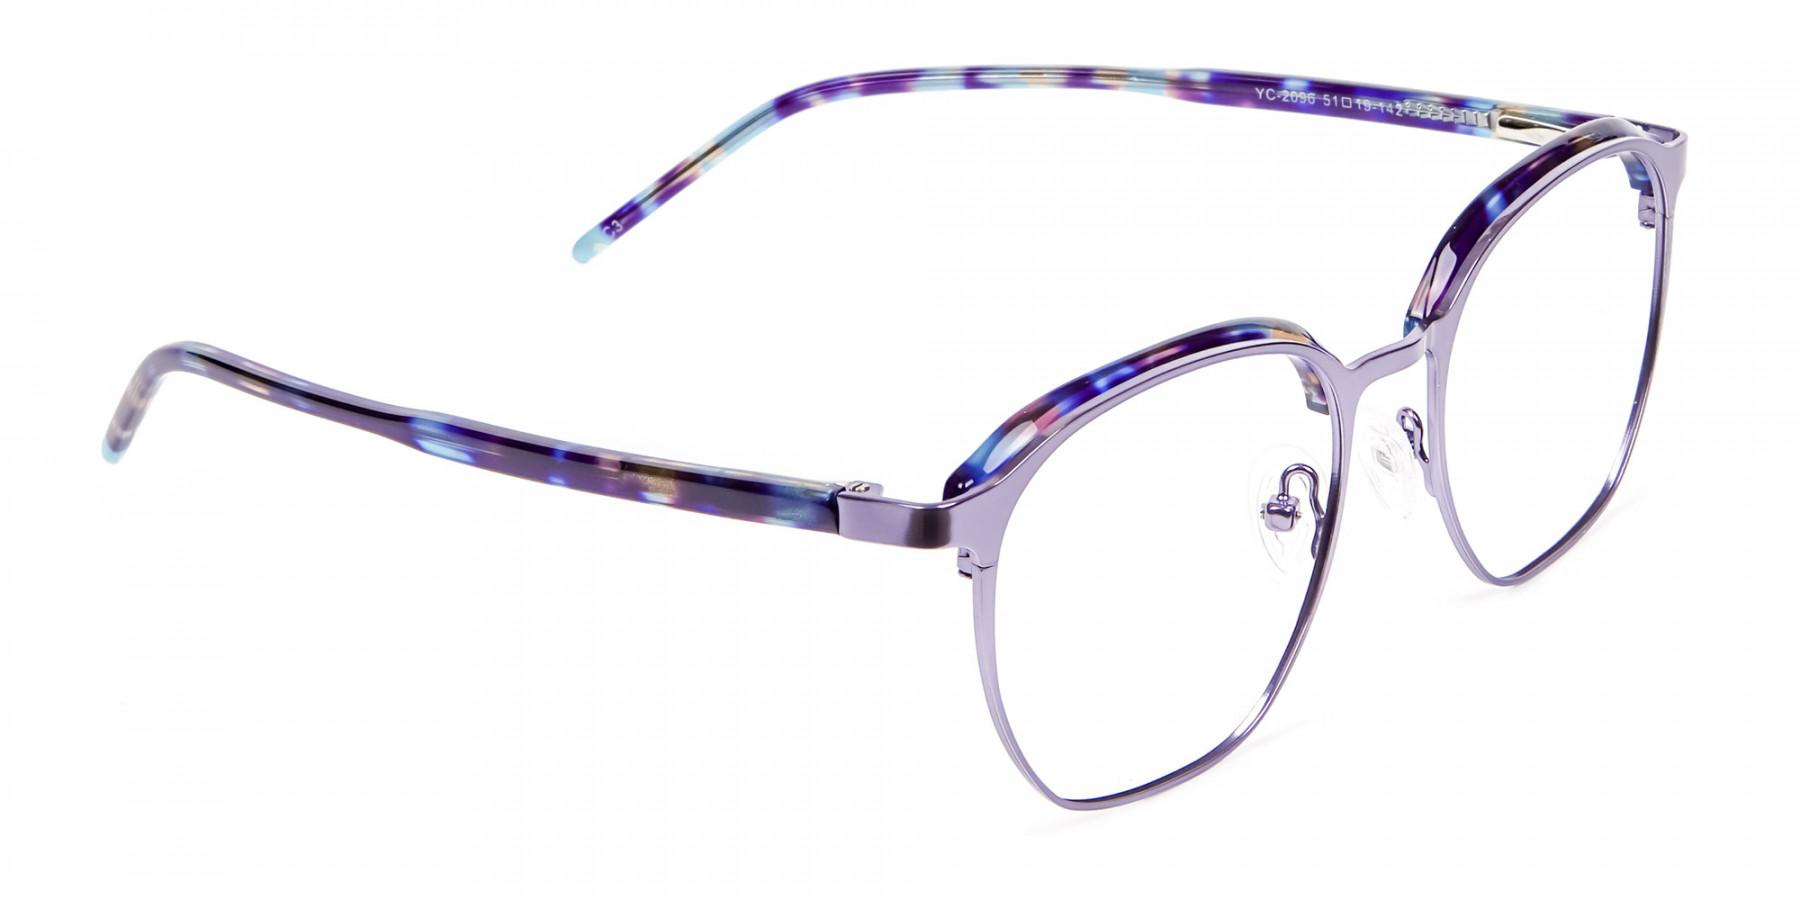 Fashion Round Metal Glasses